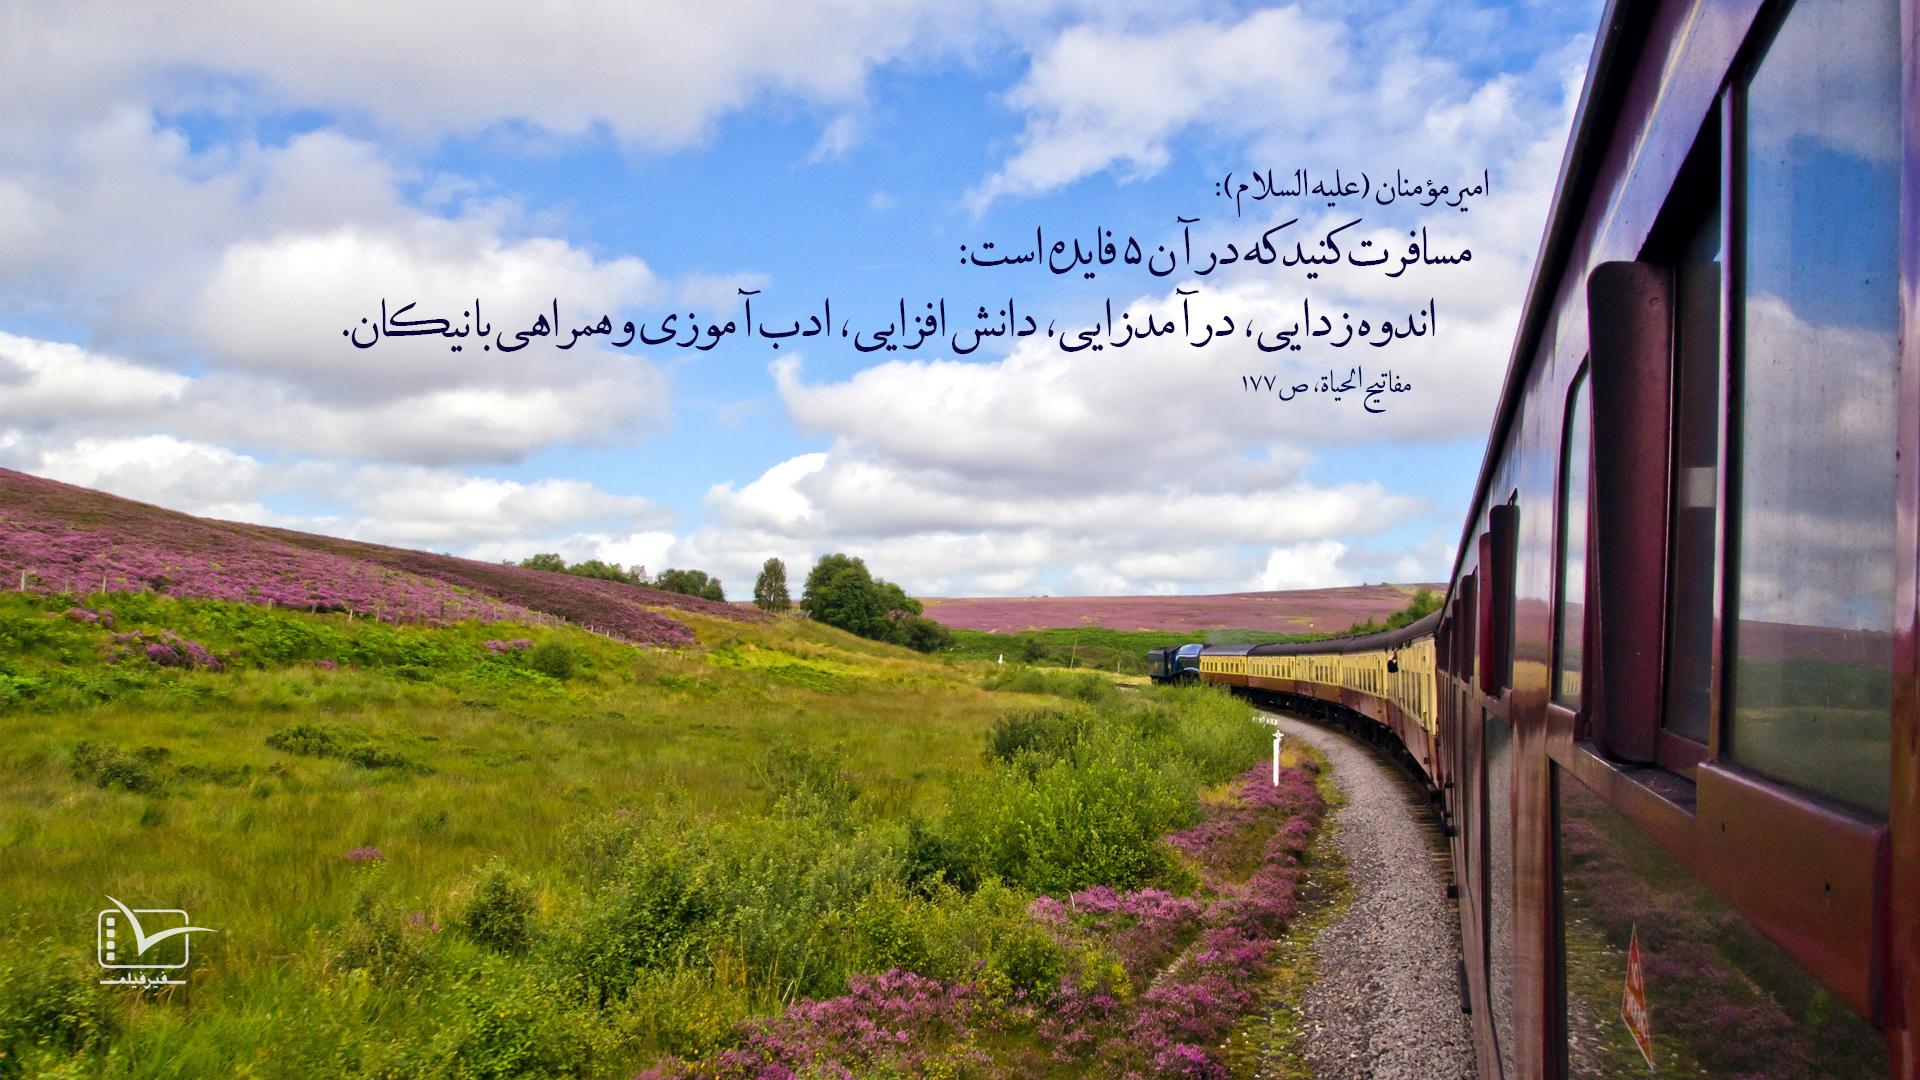 http://sabrbasirat.ir/wp-content/uploads/2016/12/Trip.jpg